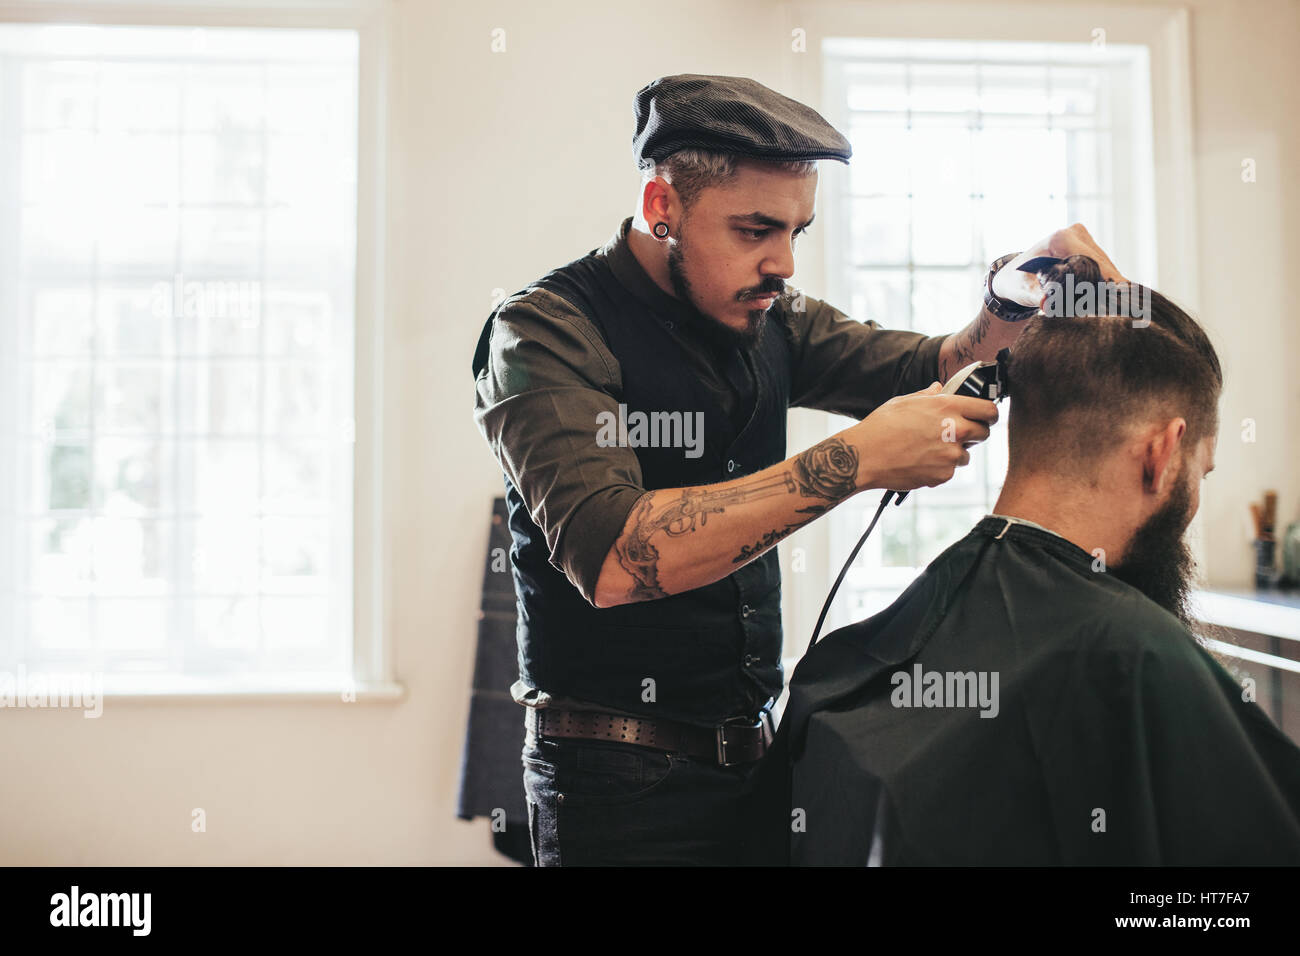 Hairstylist cutting hair of customer at barber shop. Man getting haircut at salon. - Stock Image